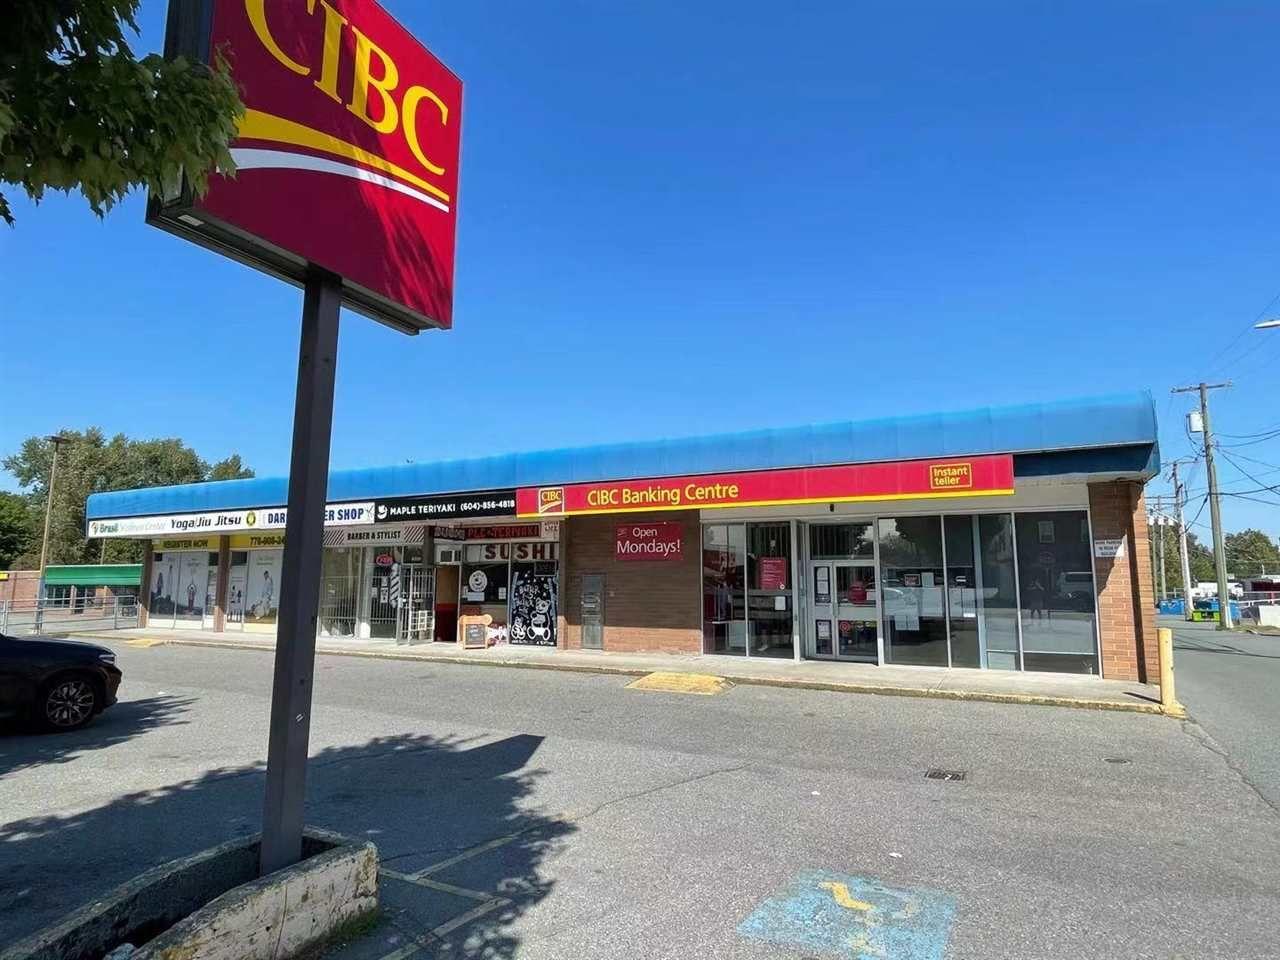 Main Photo: 3088 272 Street in Langley: Aldergrove Langley Retail for sale : MLS®# C8038443